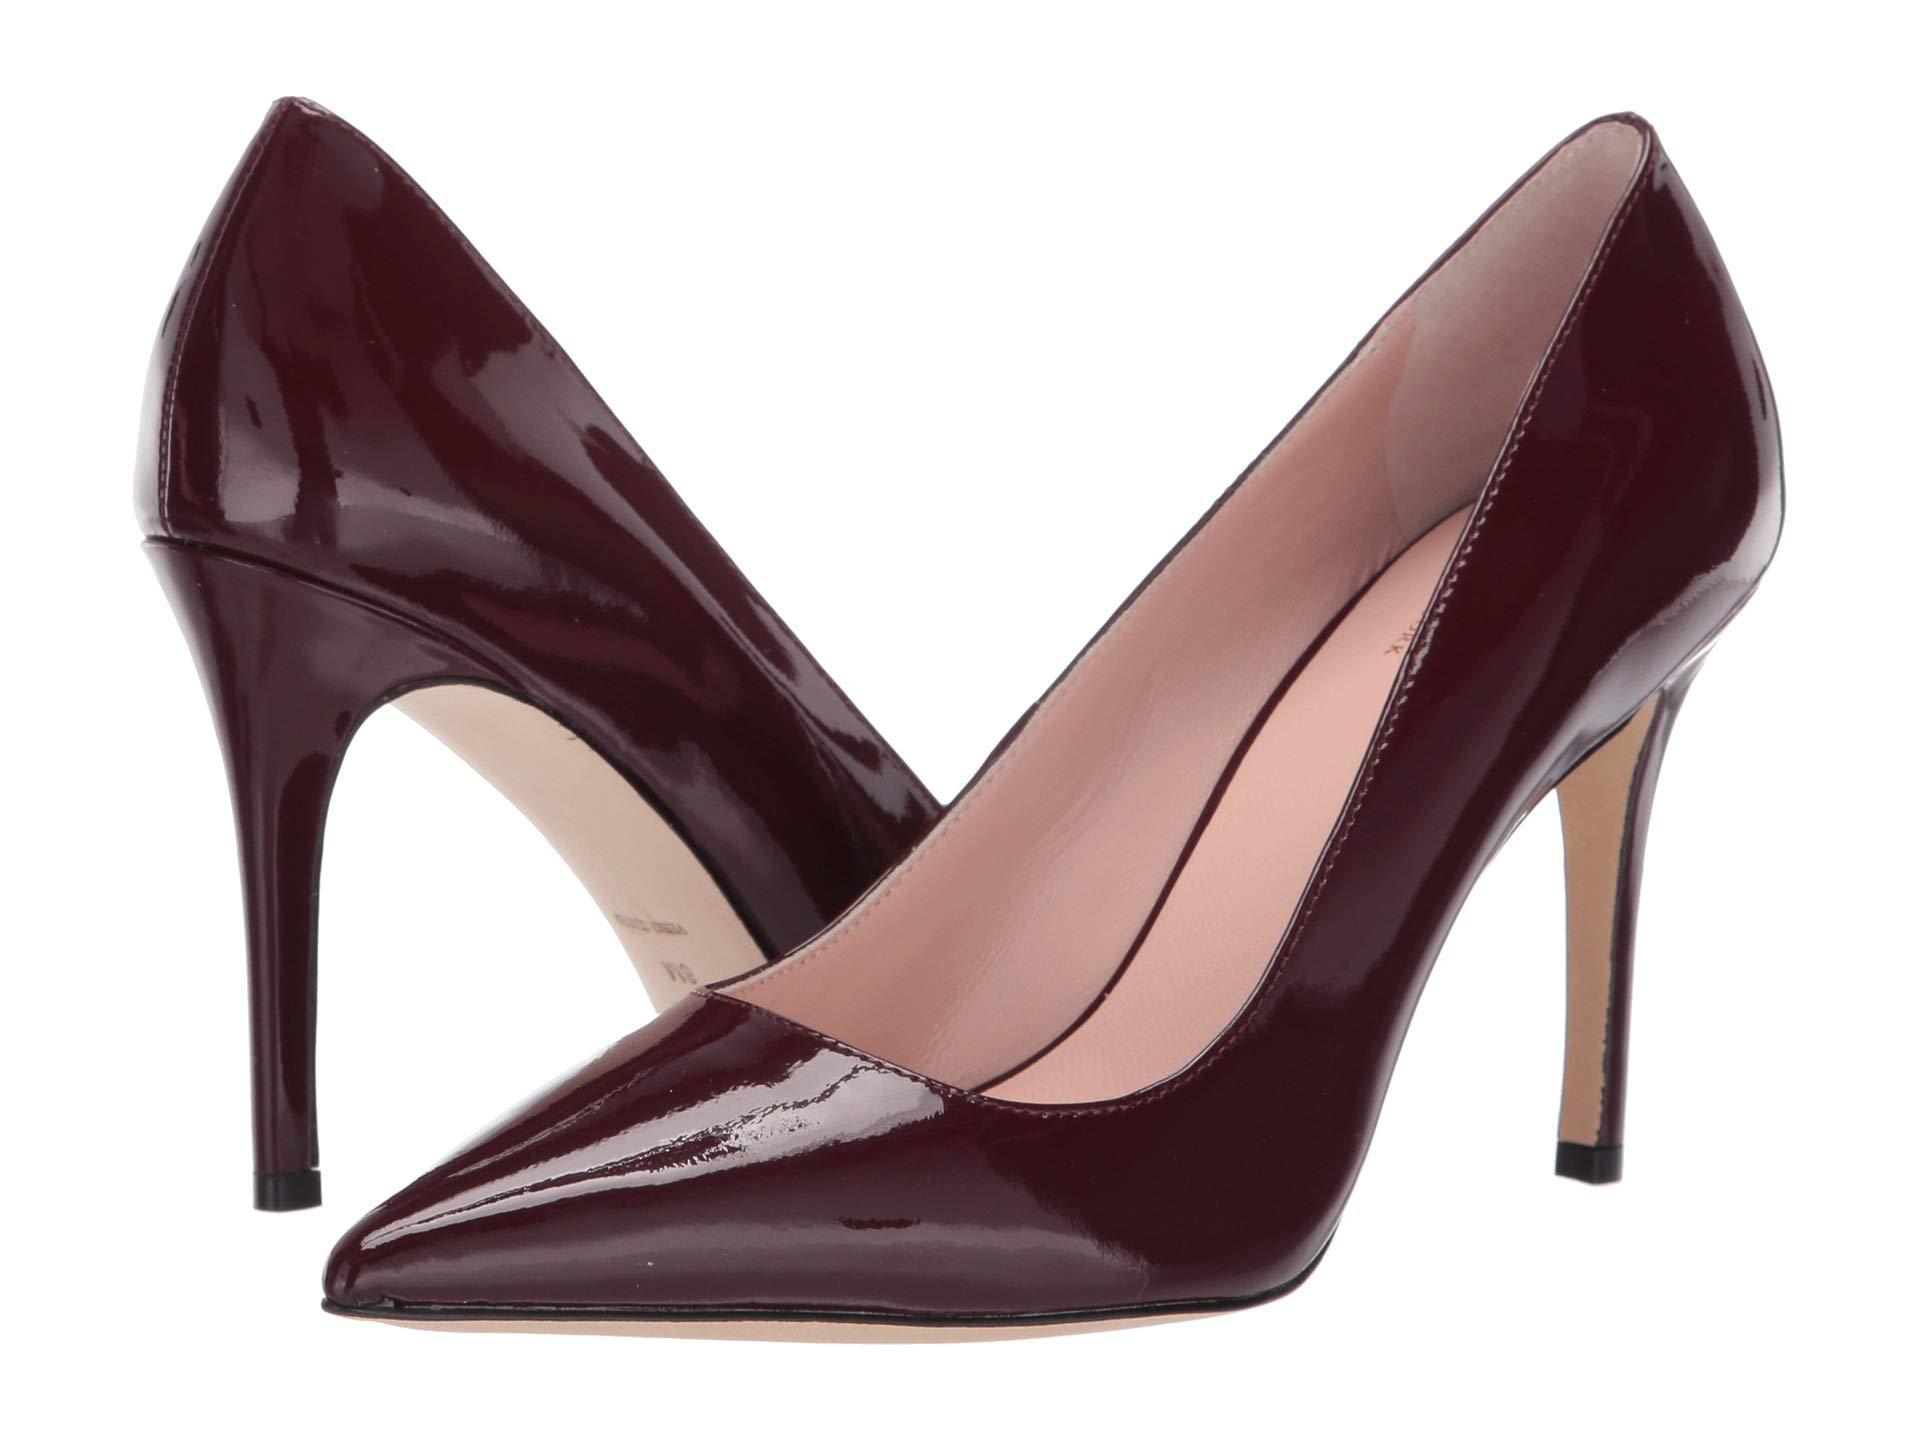 Vivian Spade Kate Deep Cherry Patent York New xdt0WHwAq0